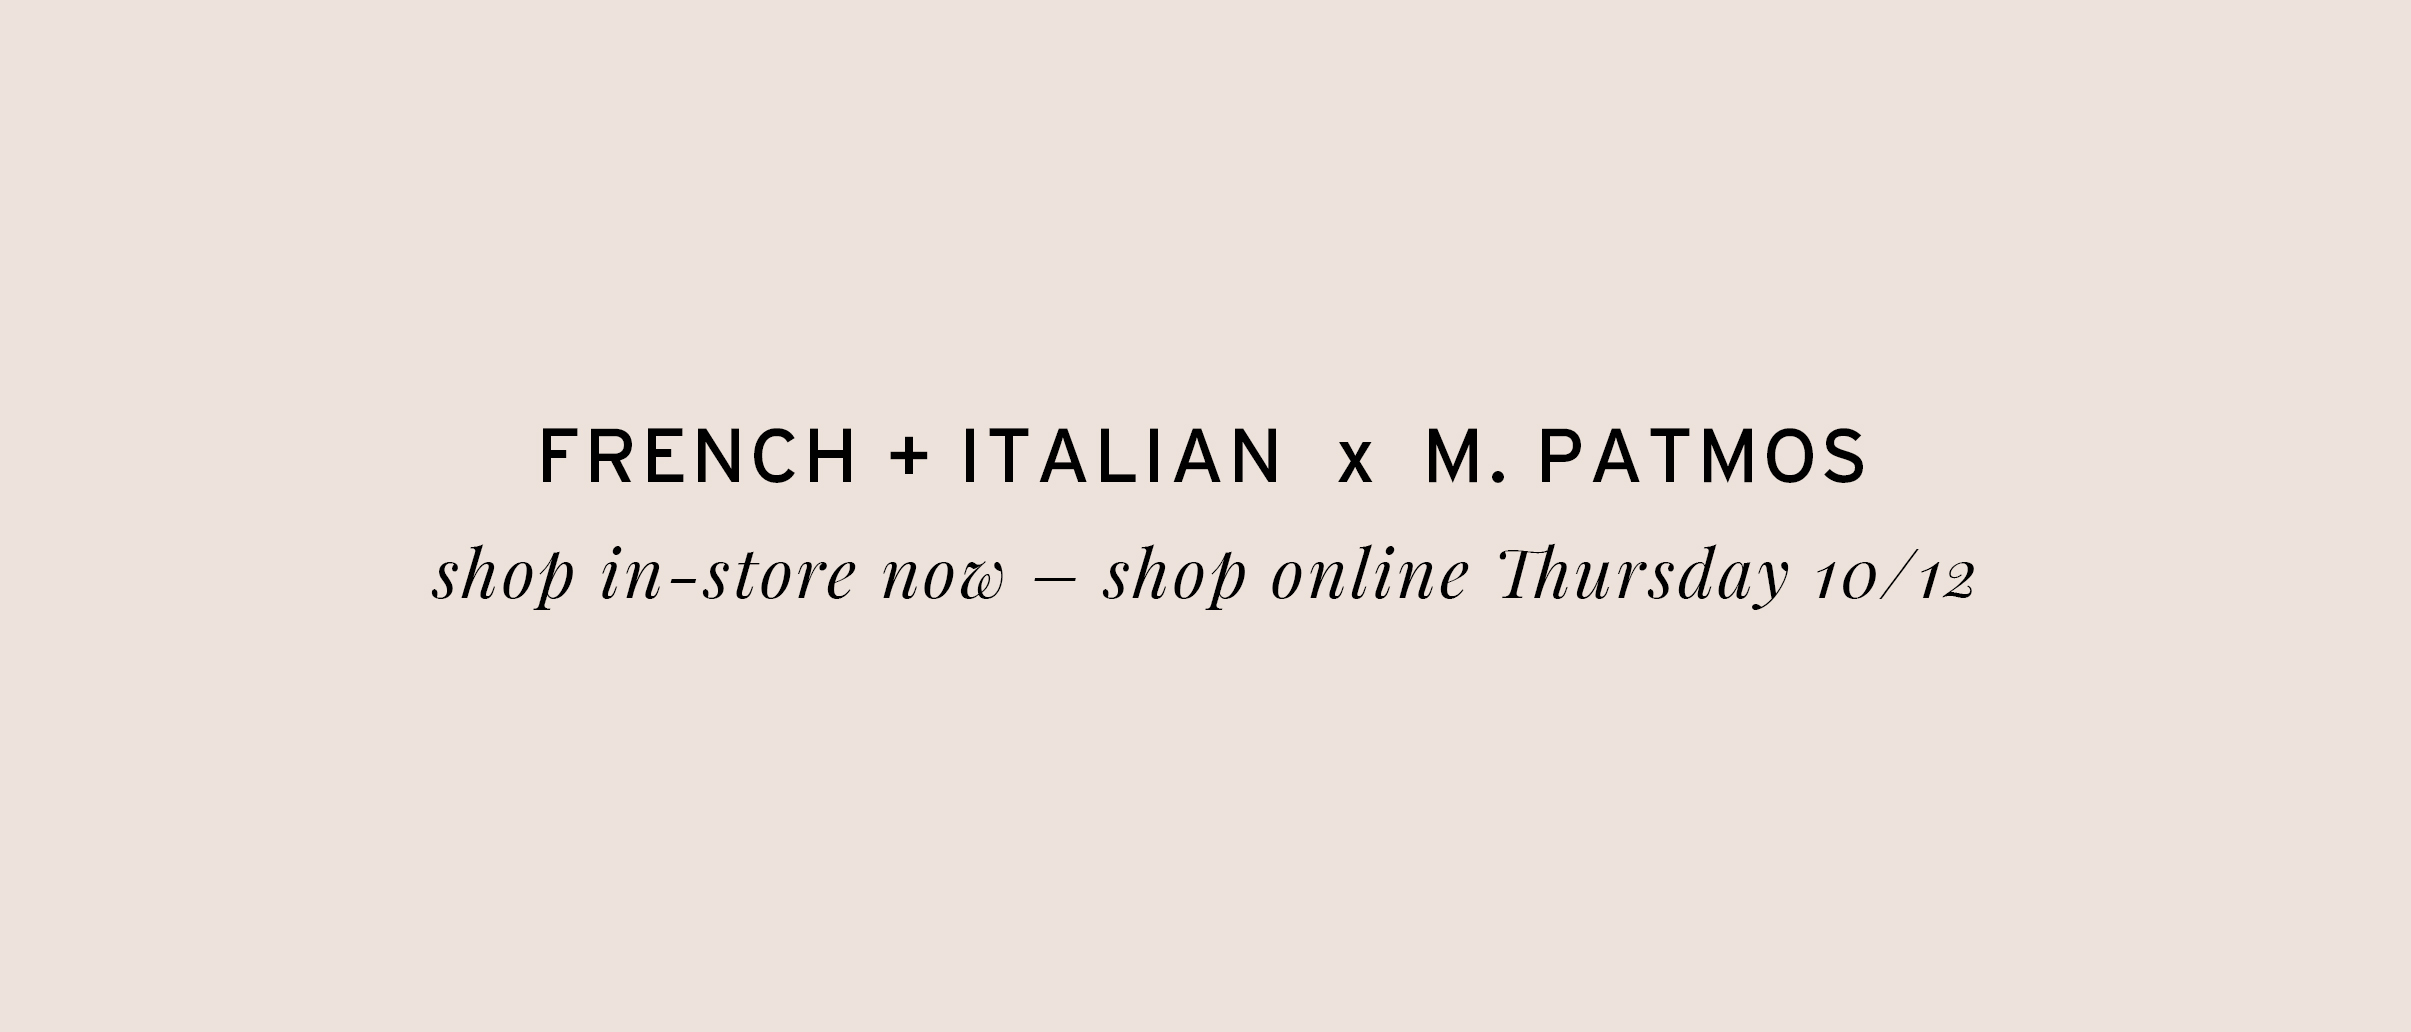 French Italian M Patmos